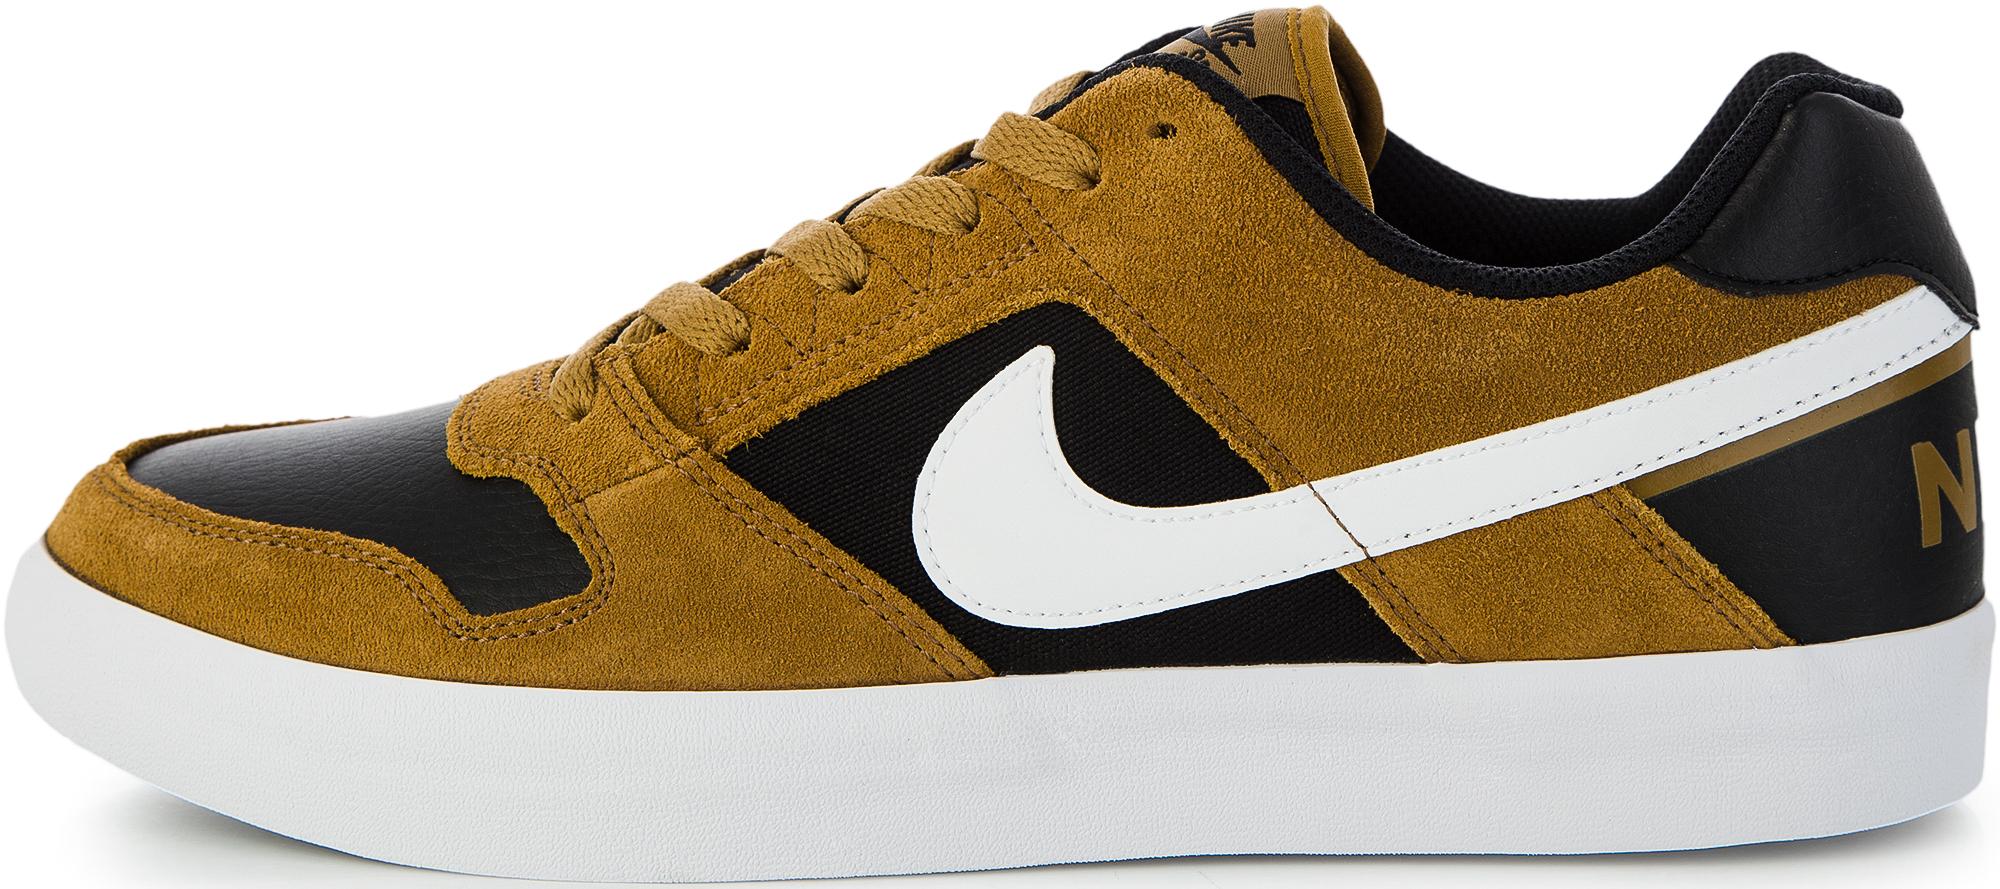 Nike Кеды мужские Nike SB Delta Force Vulc, размер 45